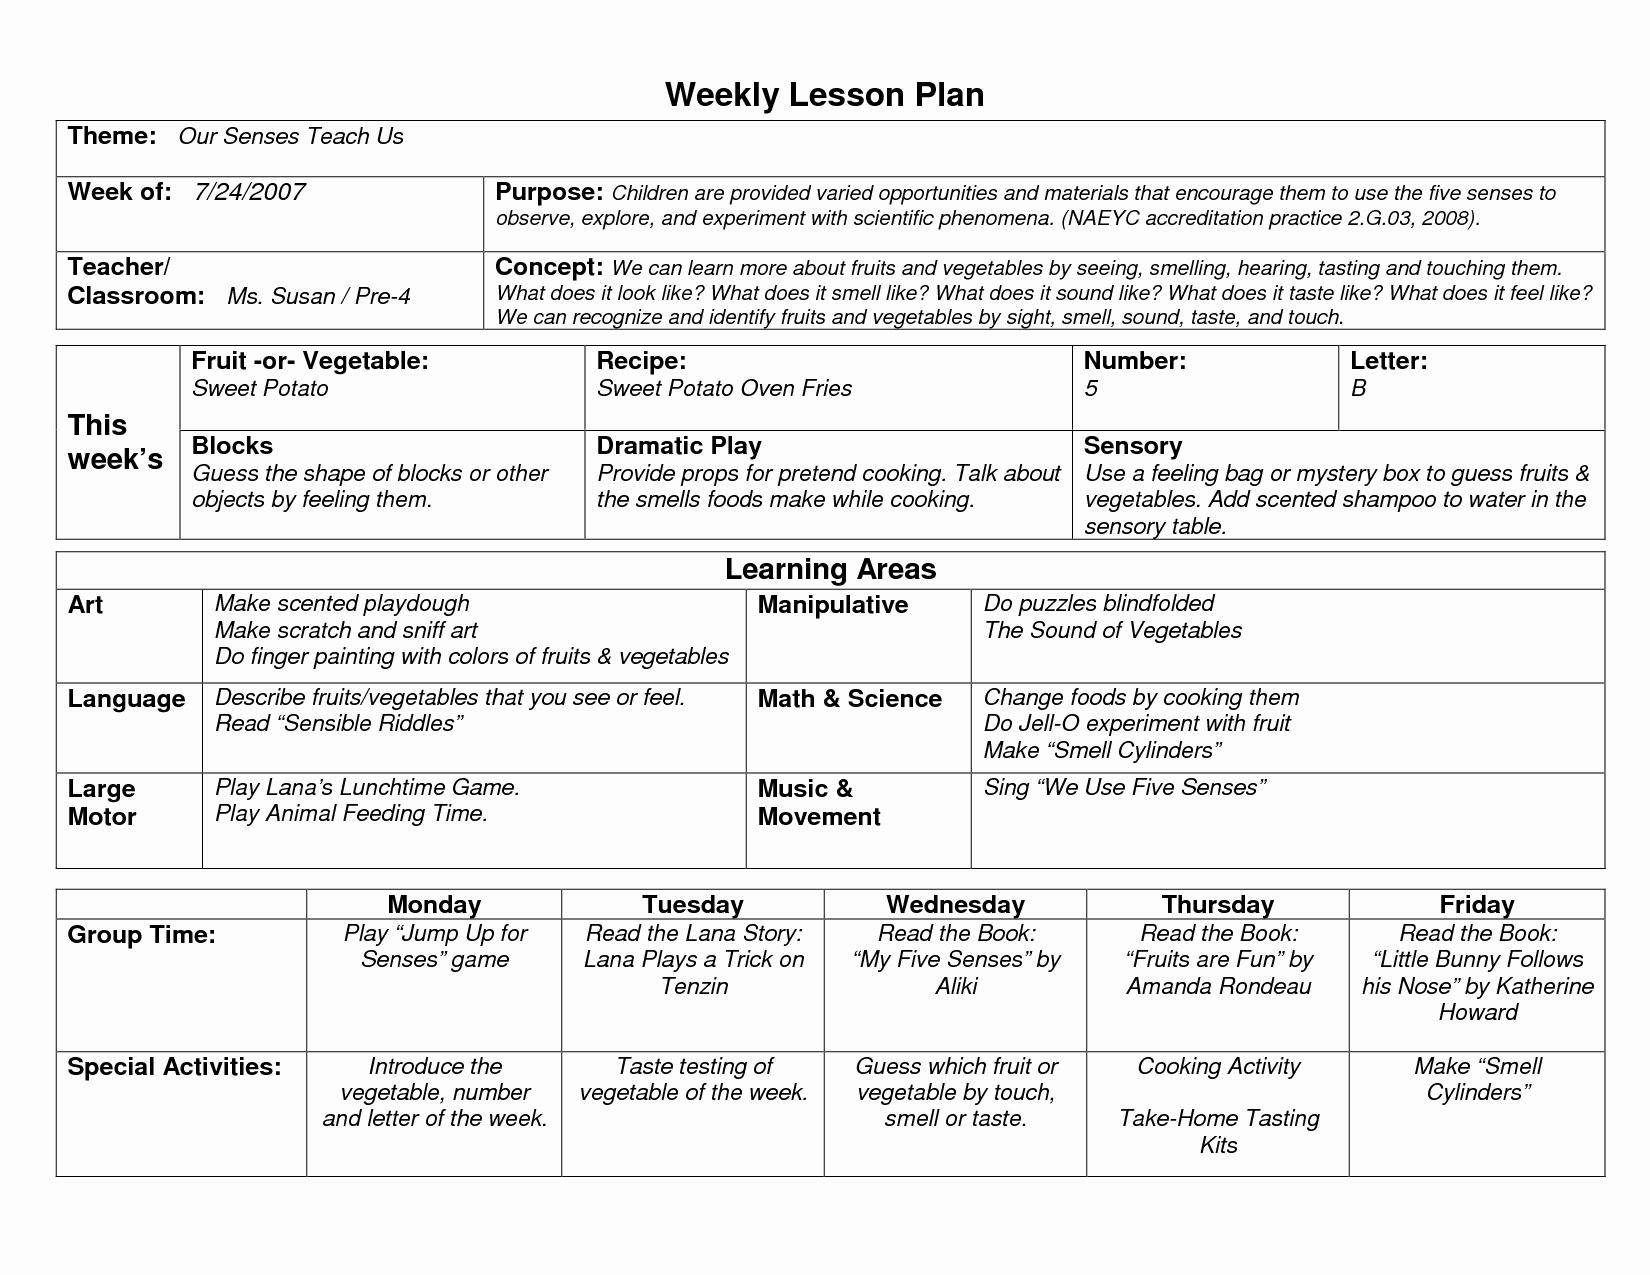 Kindergarten Lesson Plan Template Beautiful Naeyc Lesson Plan Template for Preschool